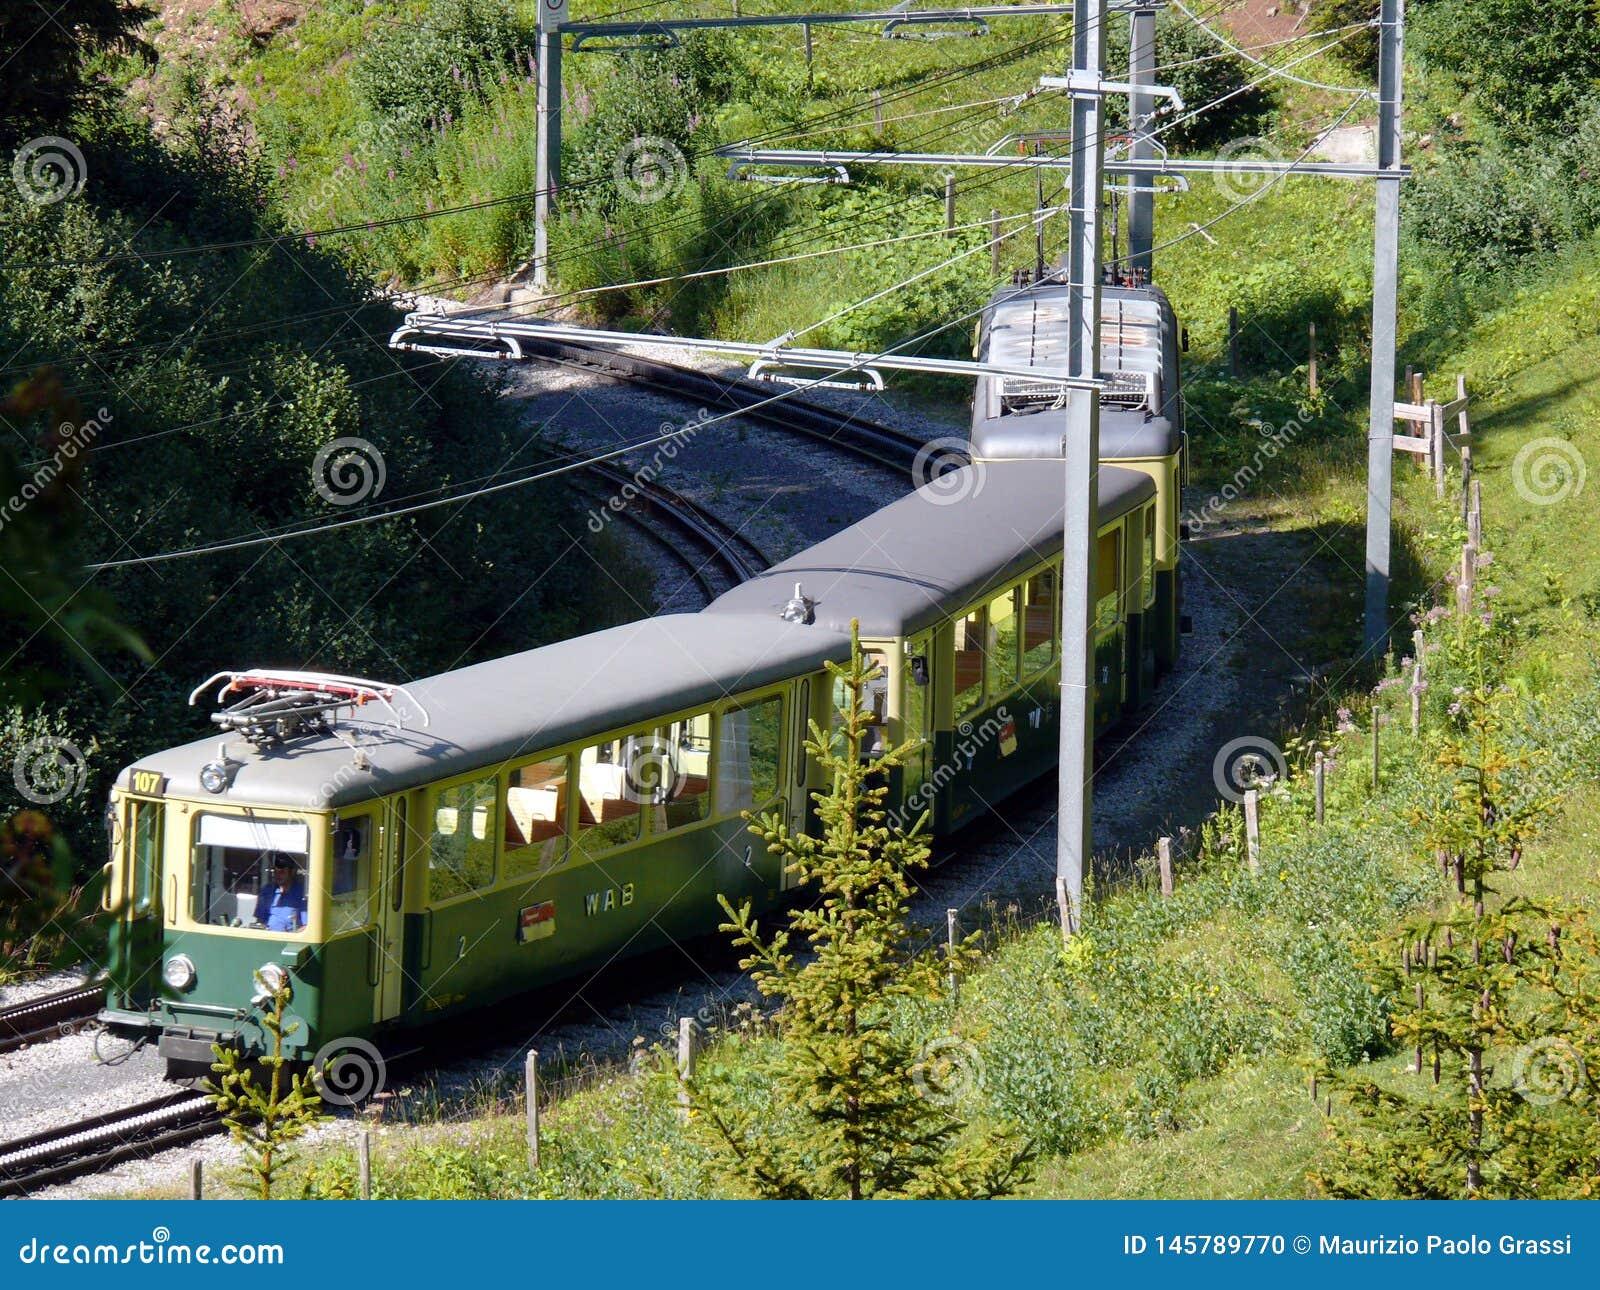 Wengen, Switzerland. 08/04/2009. Rack railway leading to the Jungfraujoch